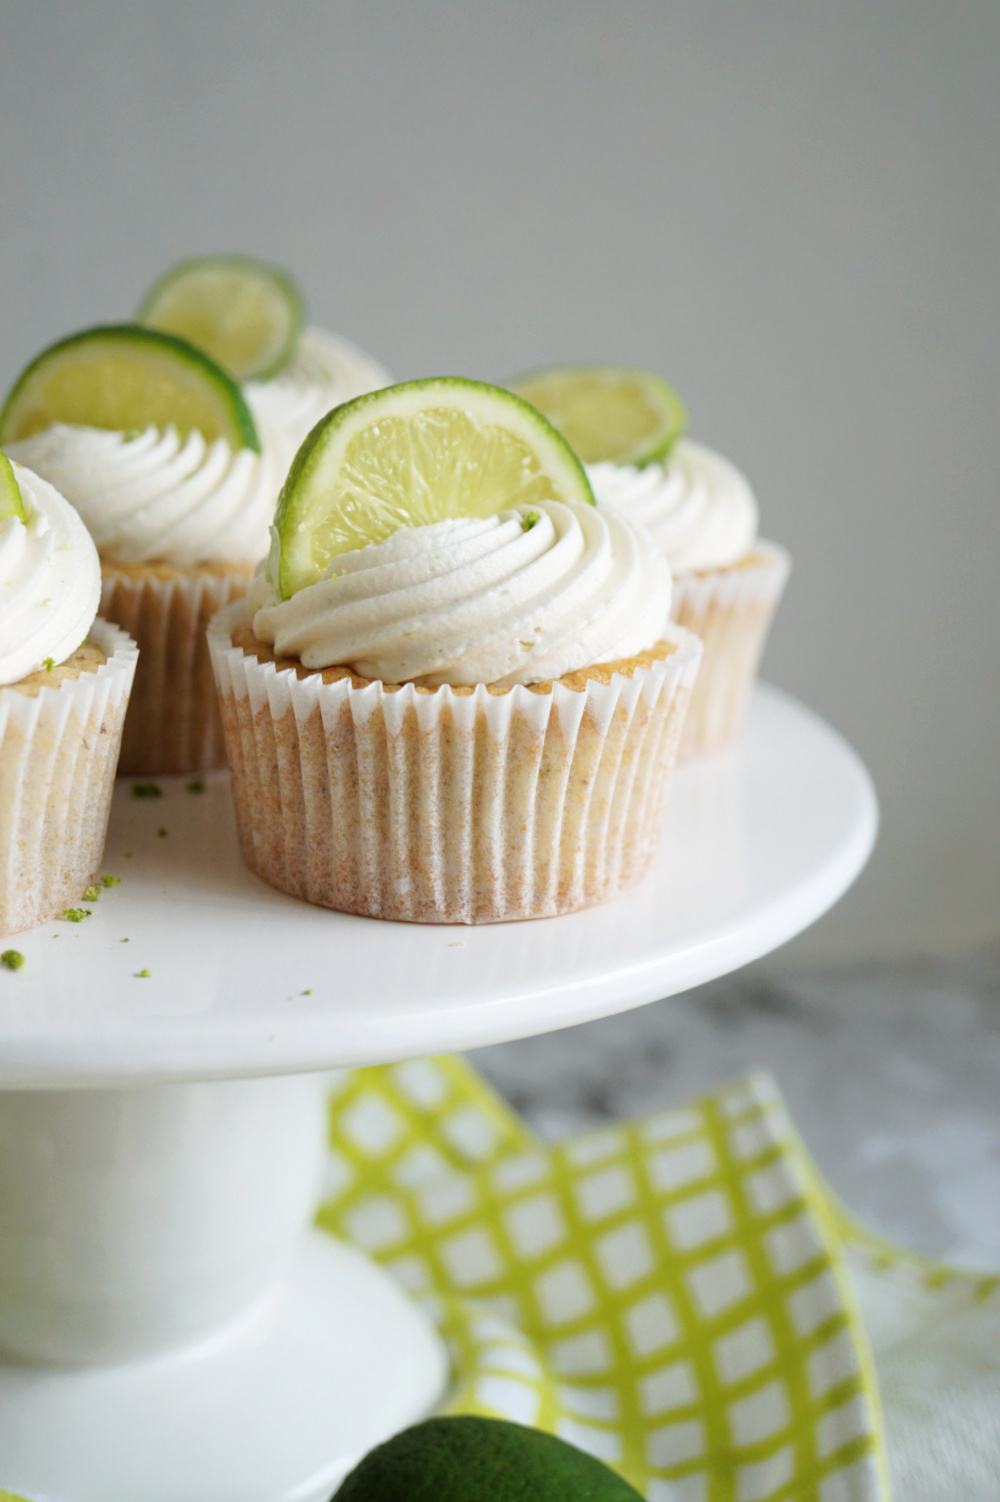 cupcake on cake stand